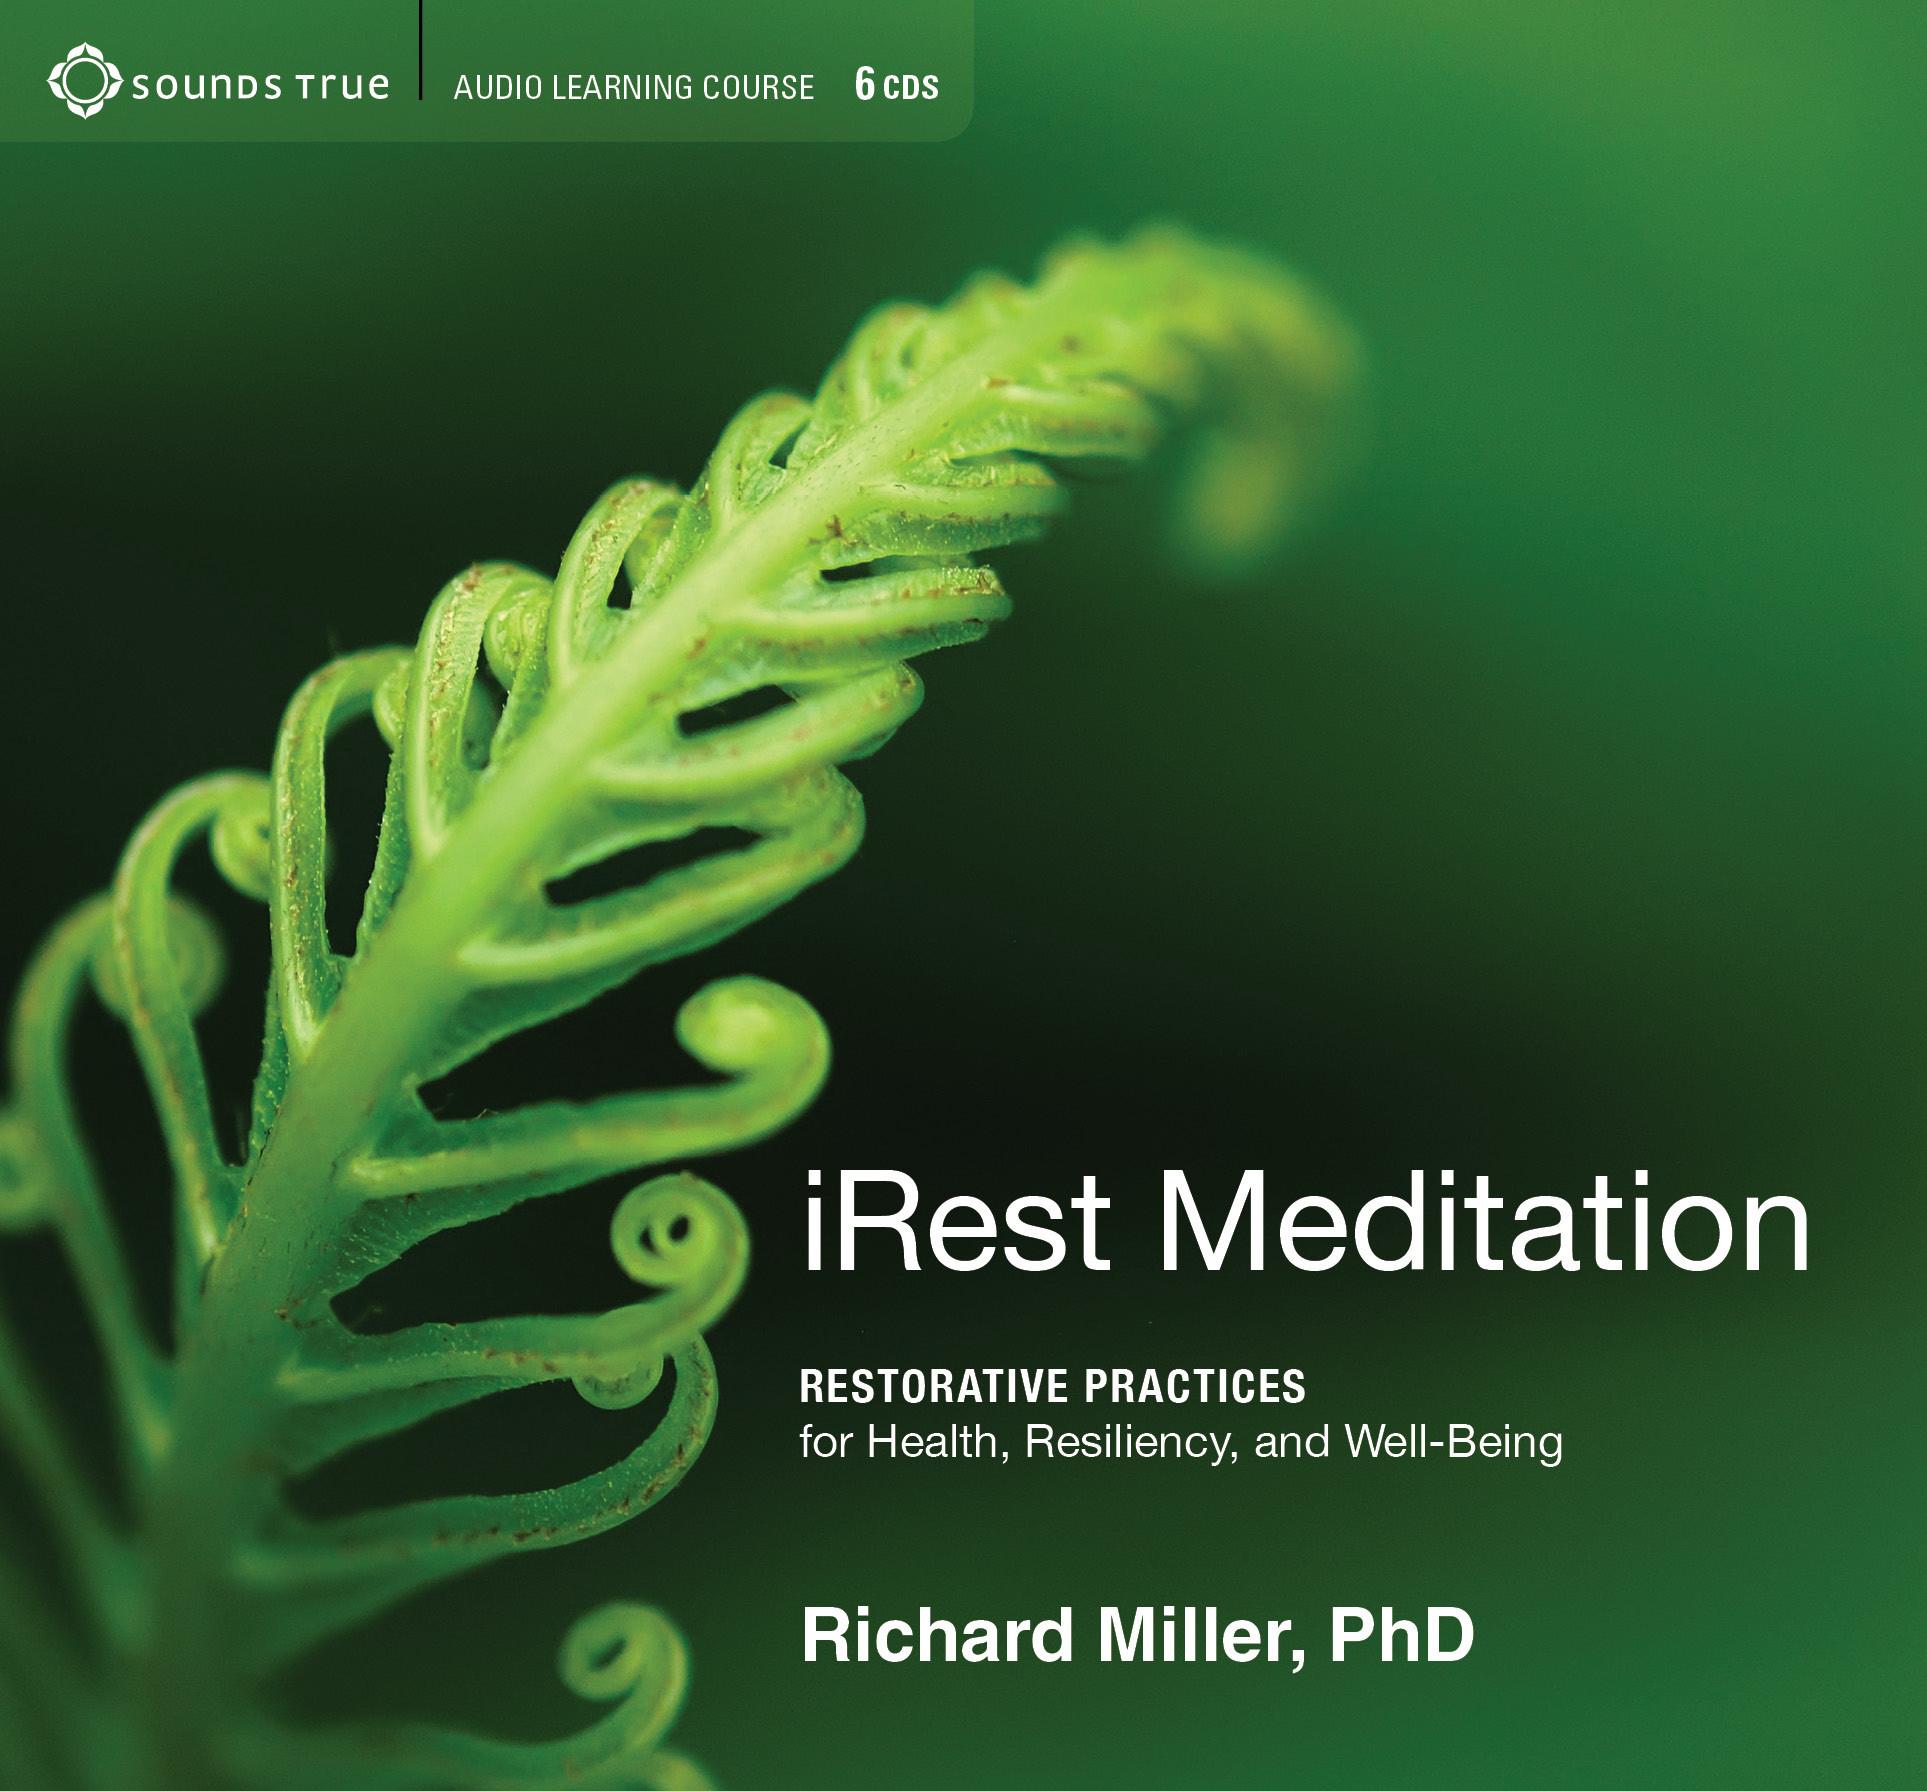 iRest Meditation